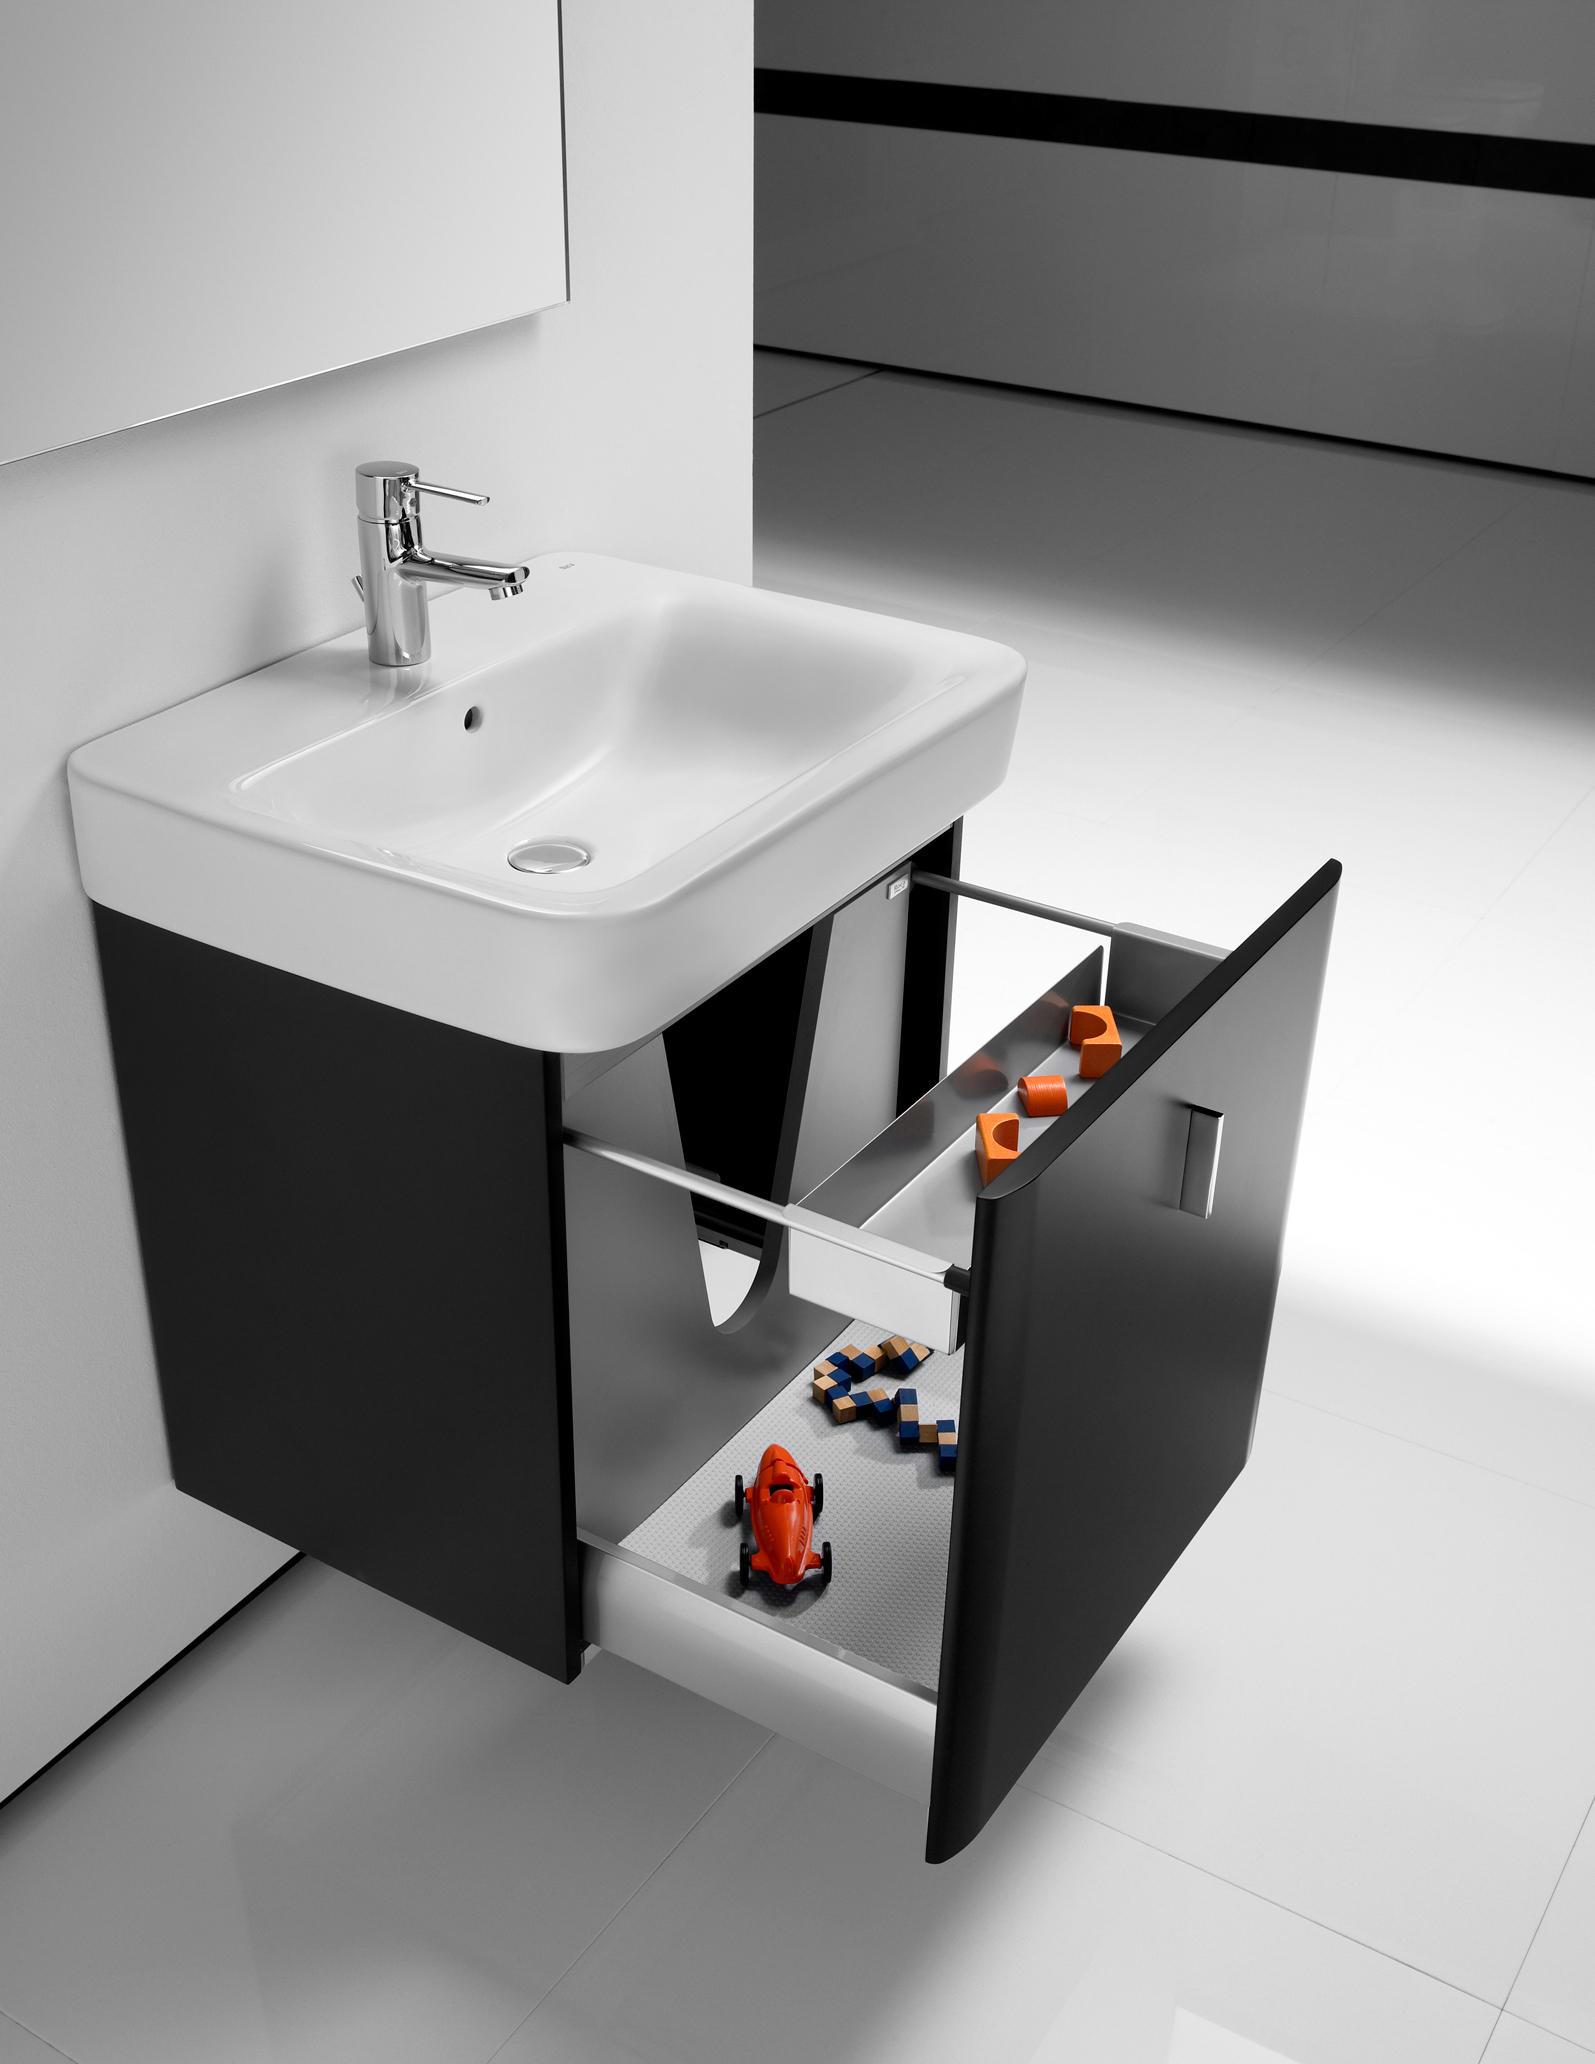 Senso square 2 0 unik vanity units by roca architonic for Roca dama senso